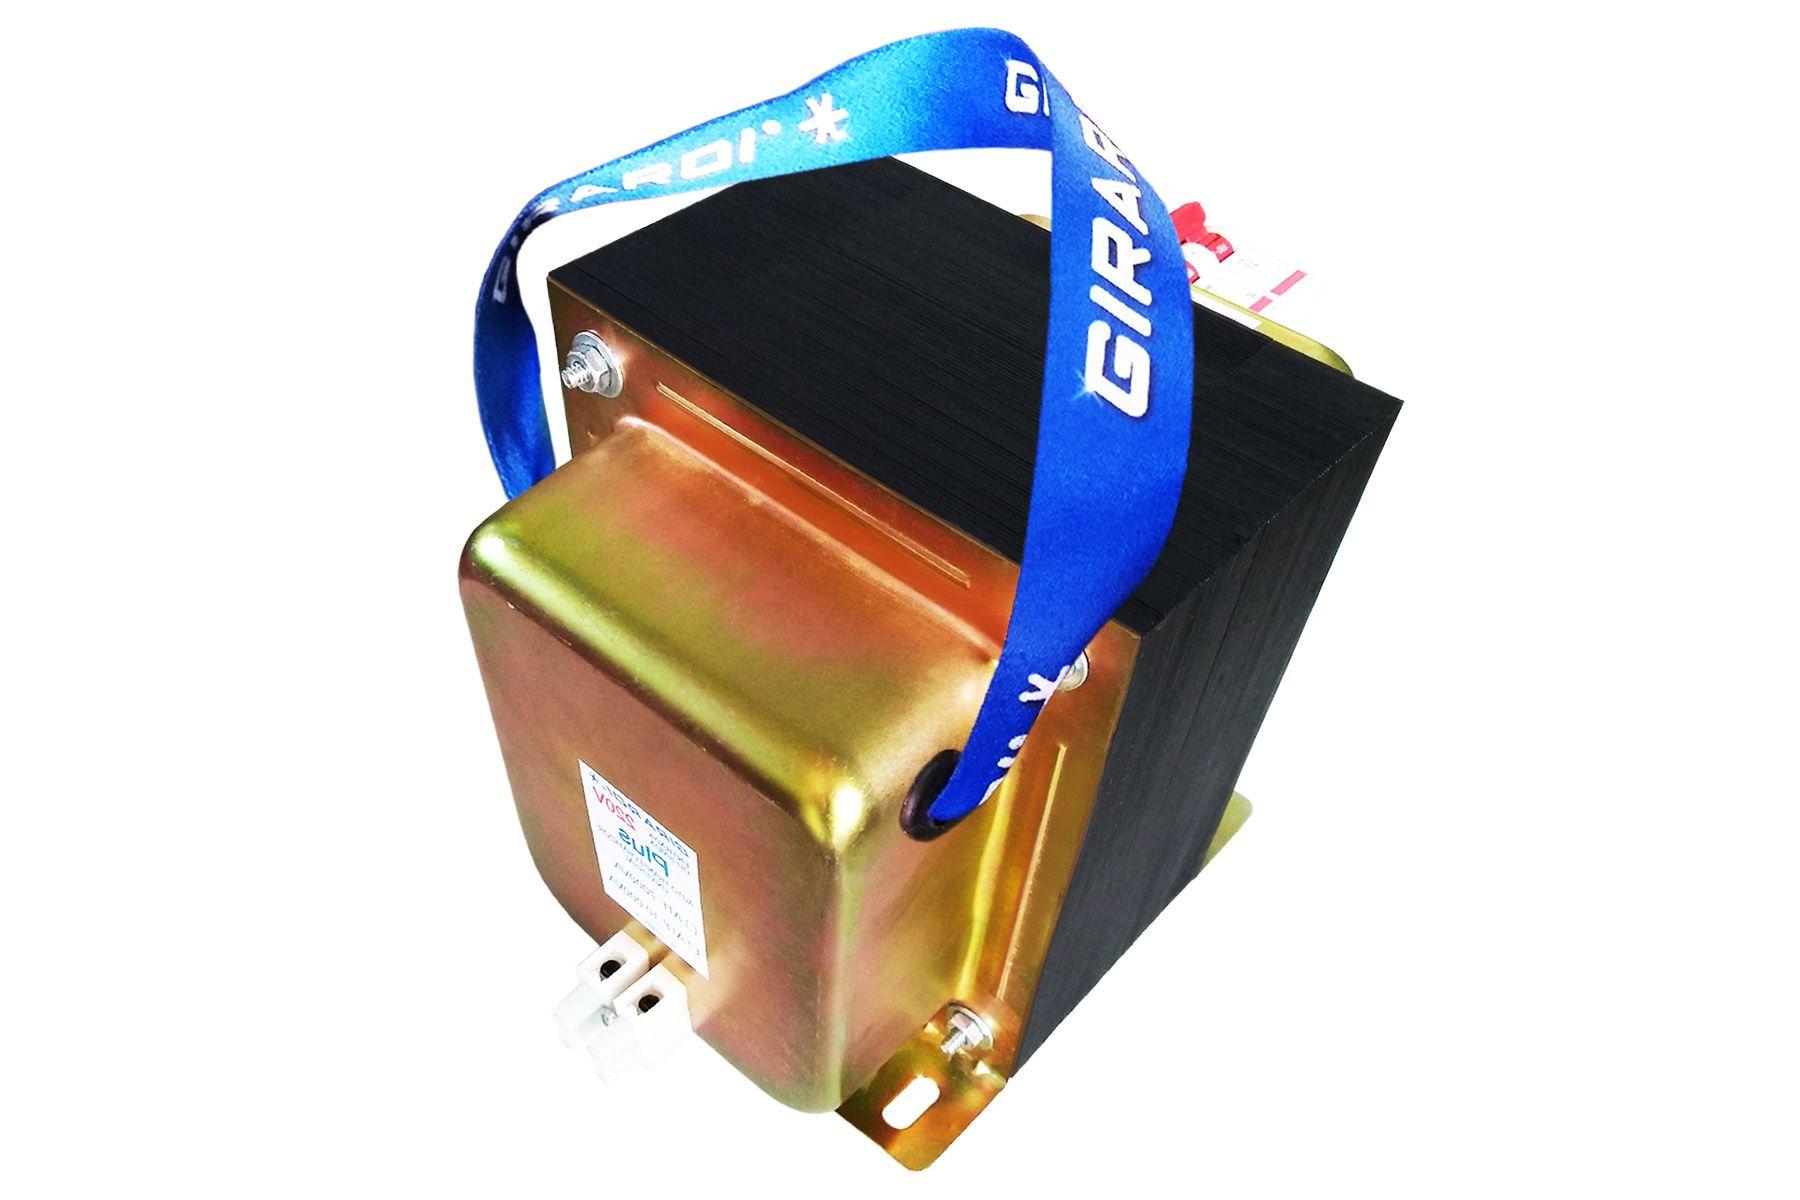 Autotransformador 10000 VA GIRARDI Bivolt com Disjuntor de Proteção